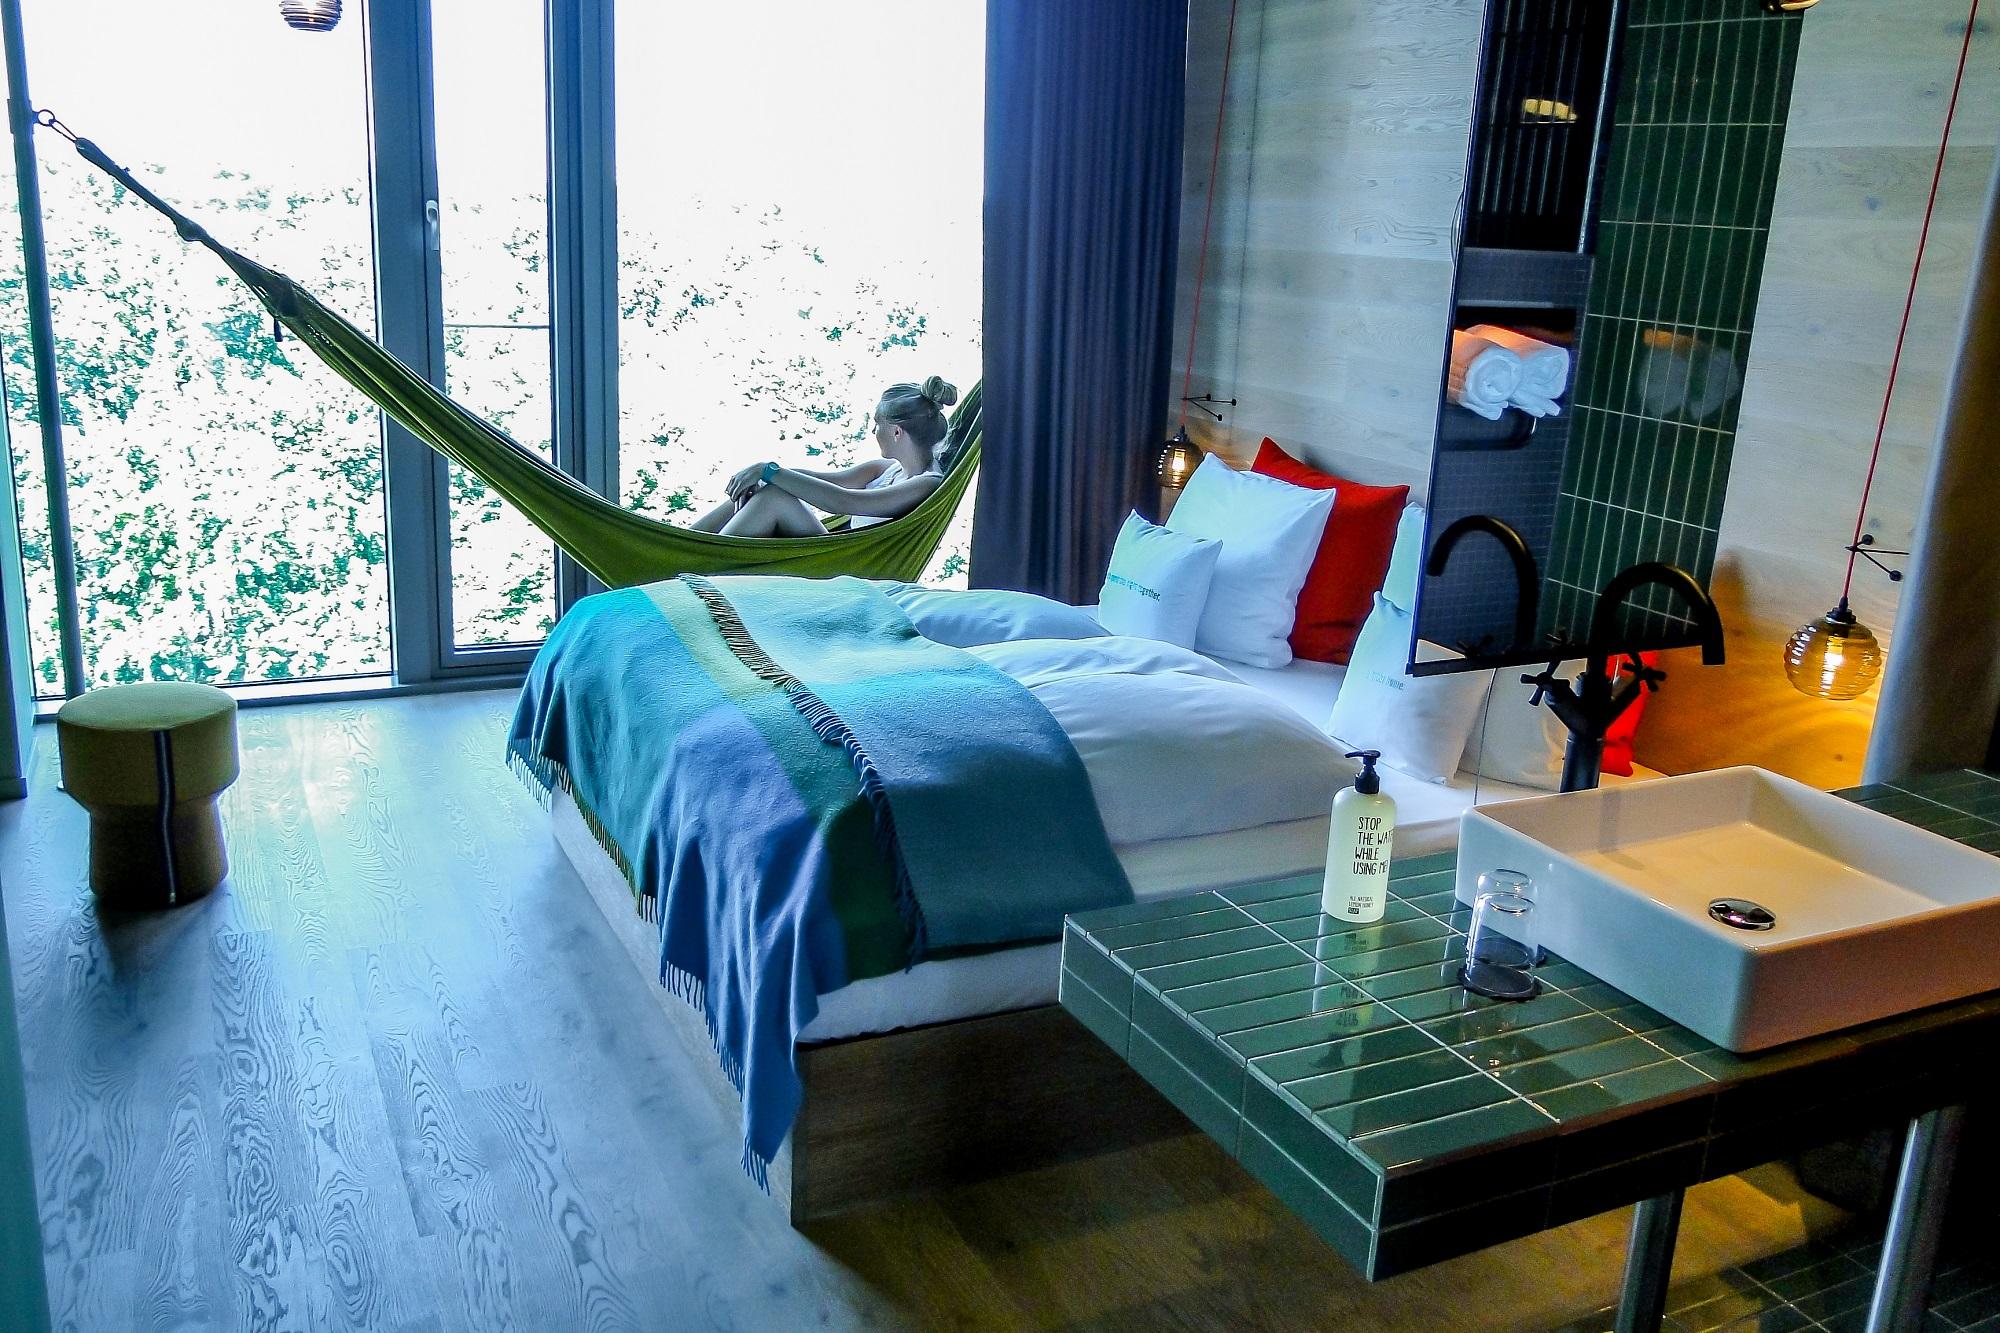 25hours hotel bikini Berlijn